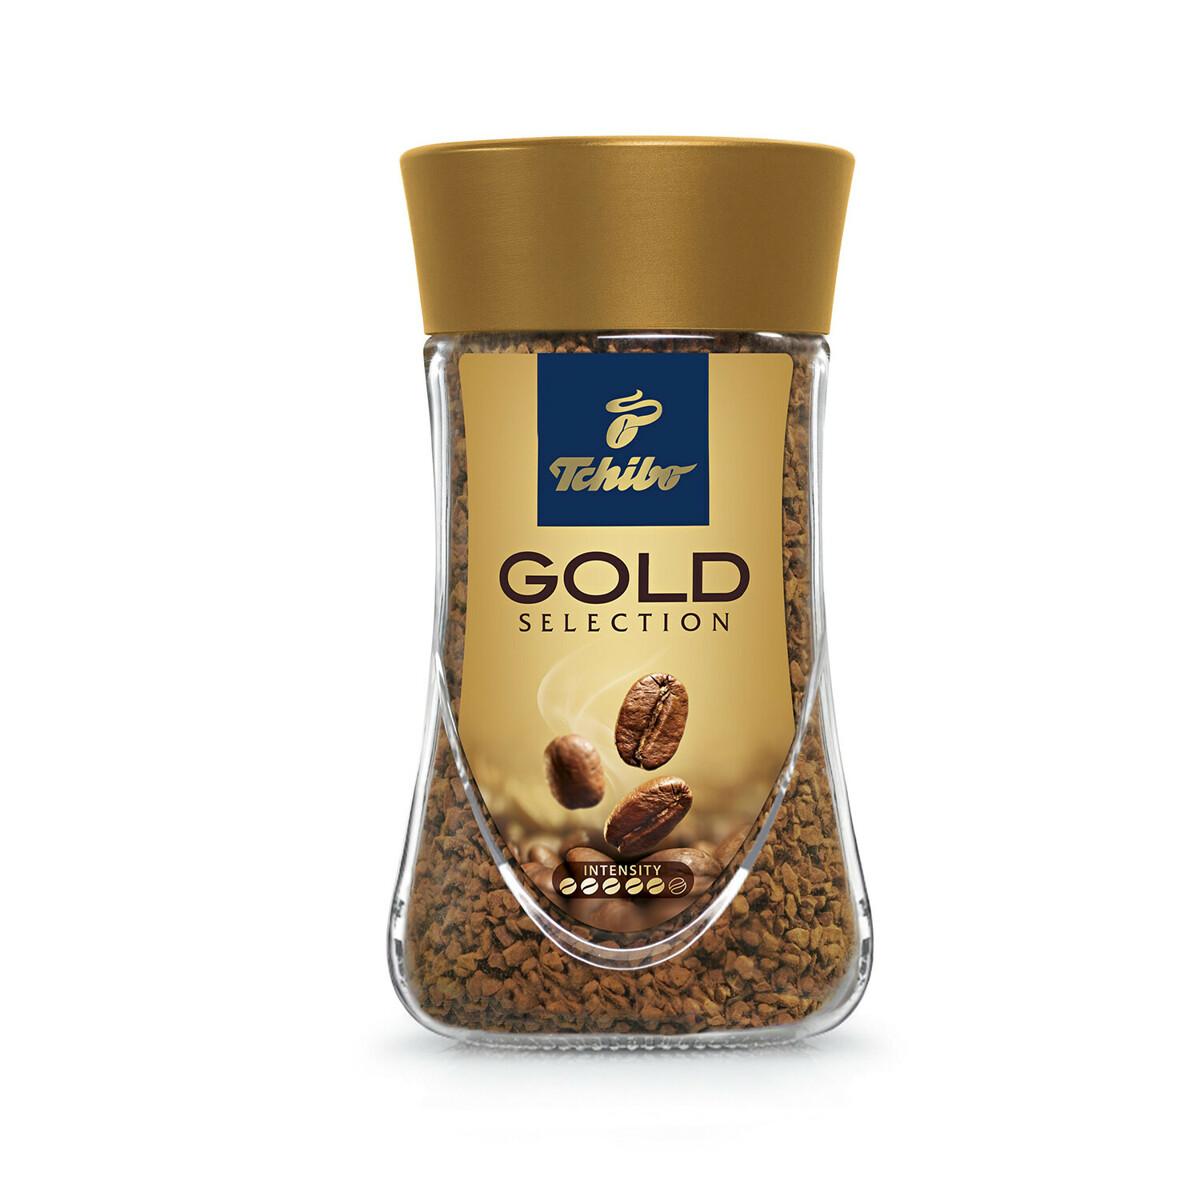 TCHIBO GOLD SELECTION CAM KAVANOZ 100 GR